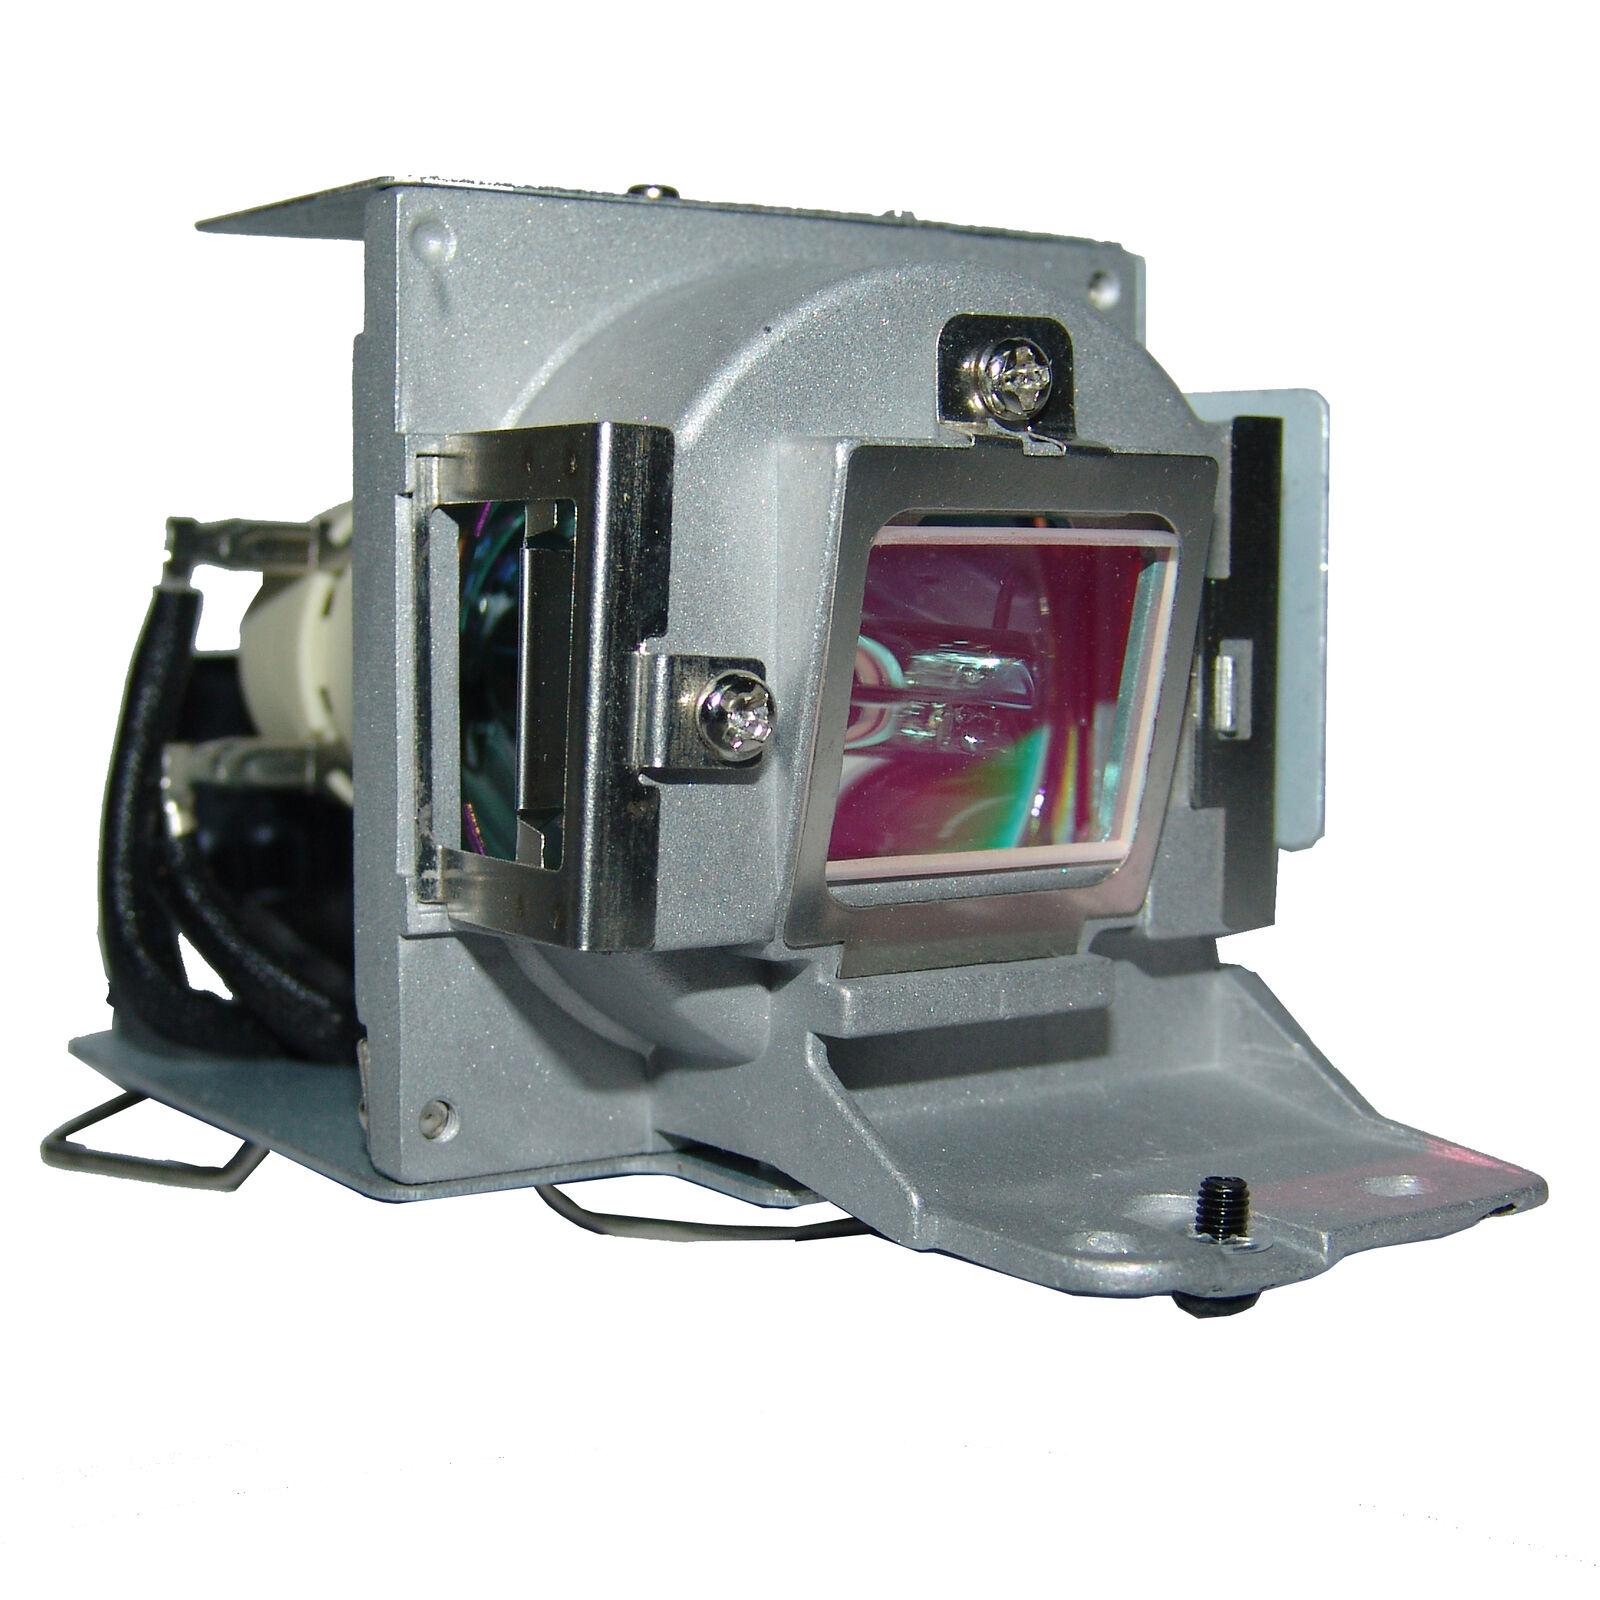 LV-LP40 LVLP40 لكانون LVWX300ST LV-WX300ST العارض المصباح الكهربي مع الإسكان